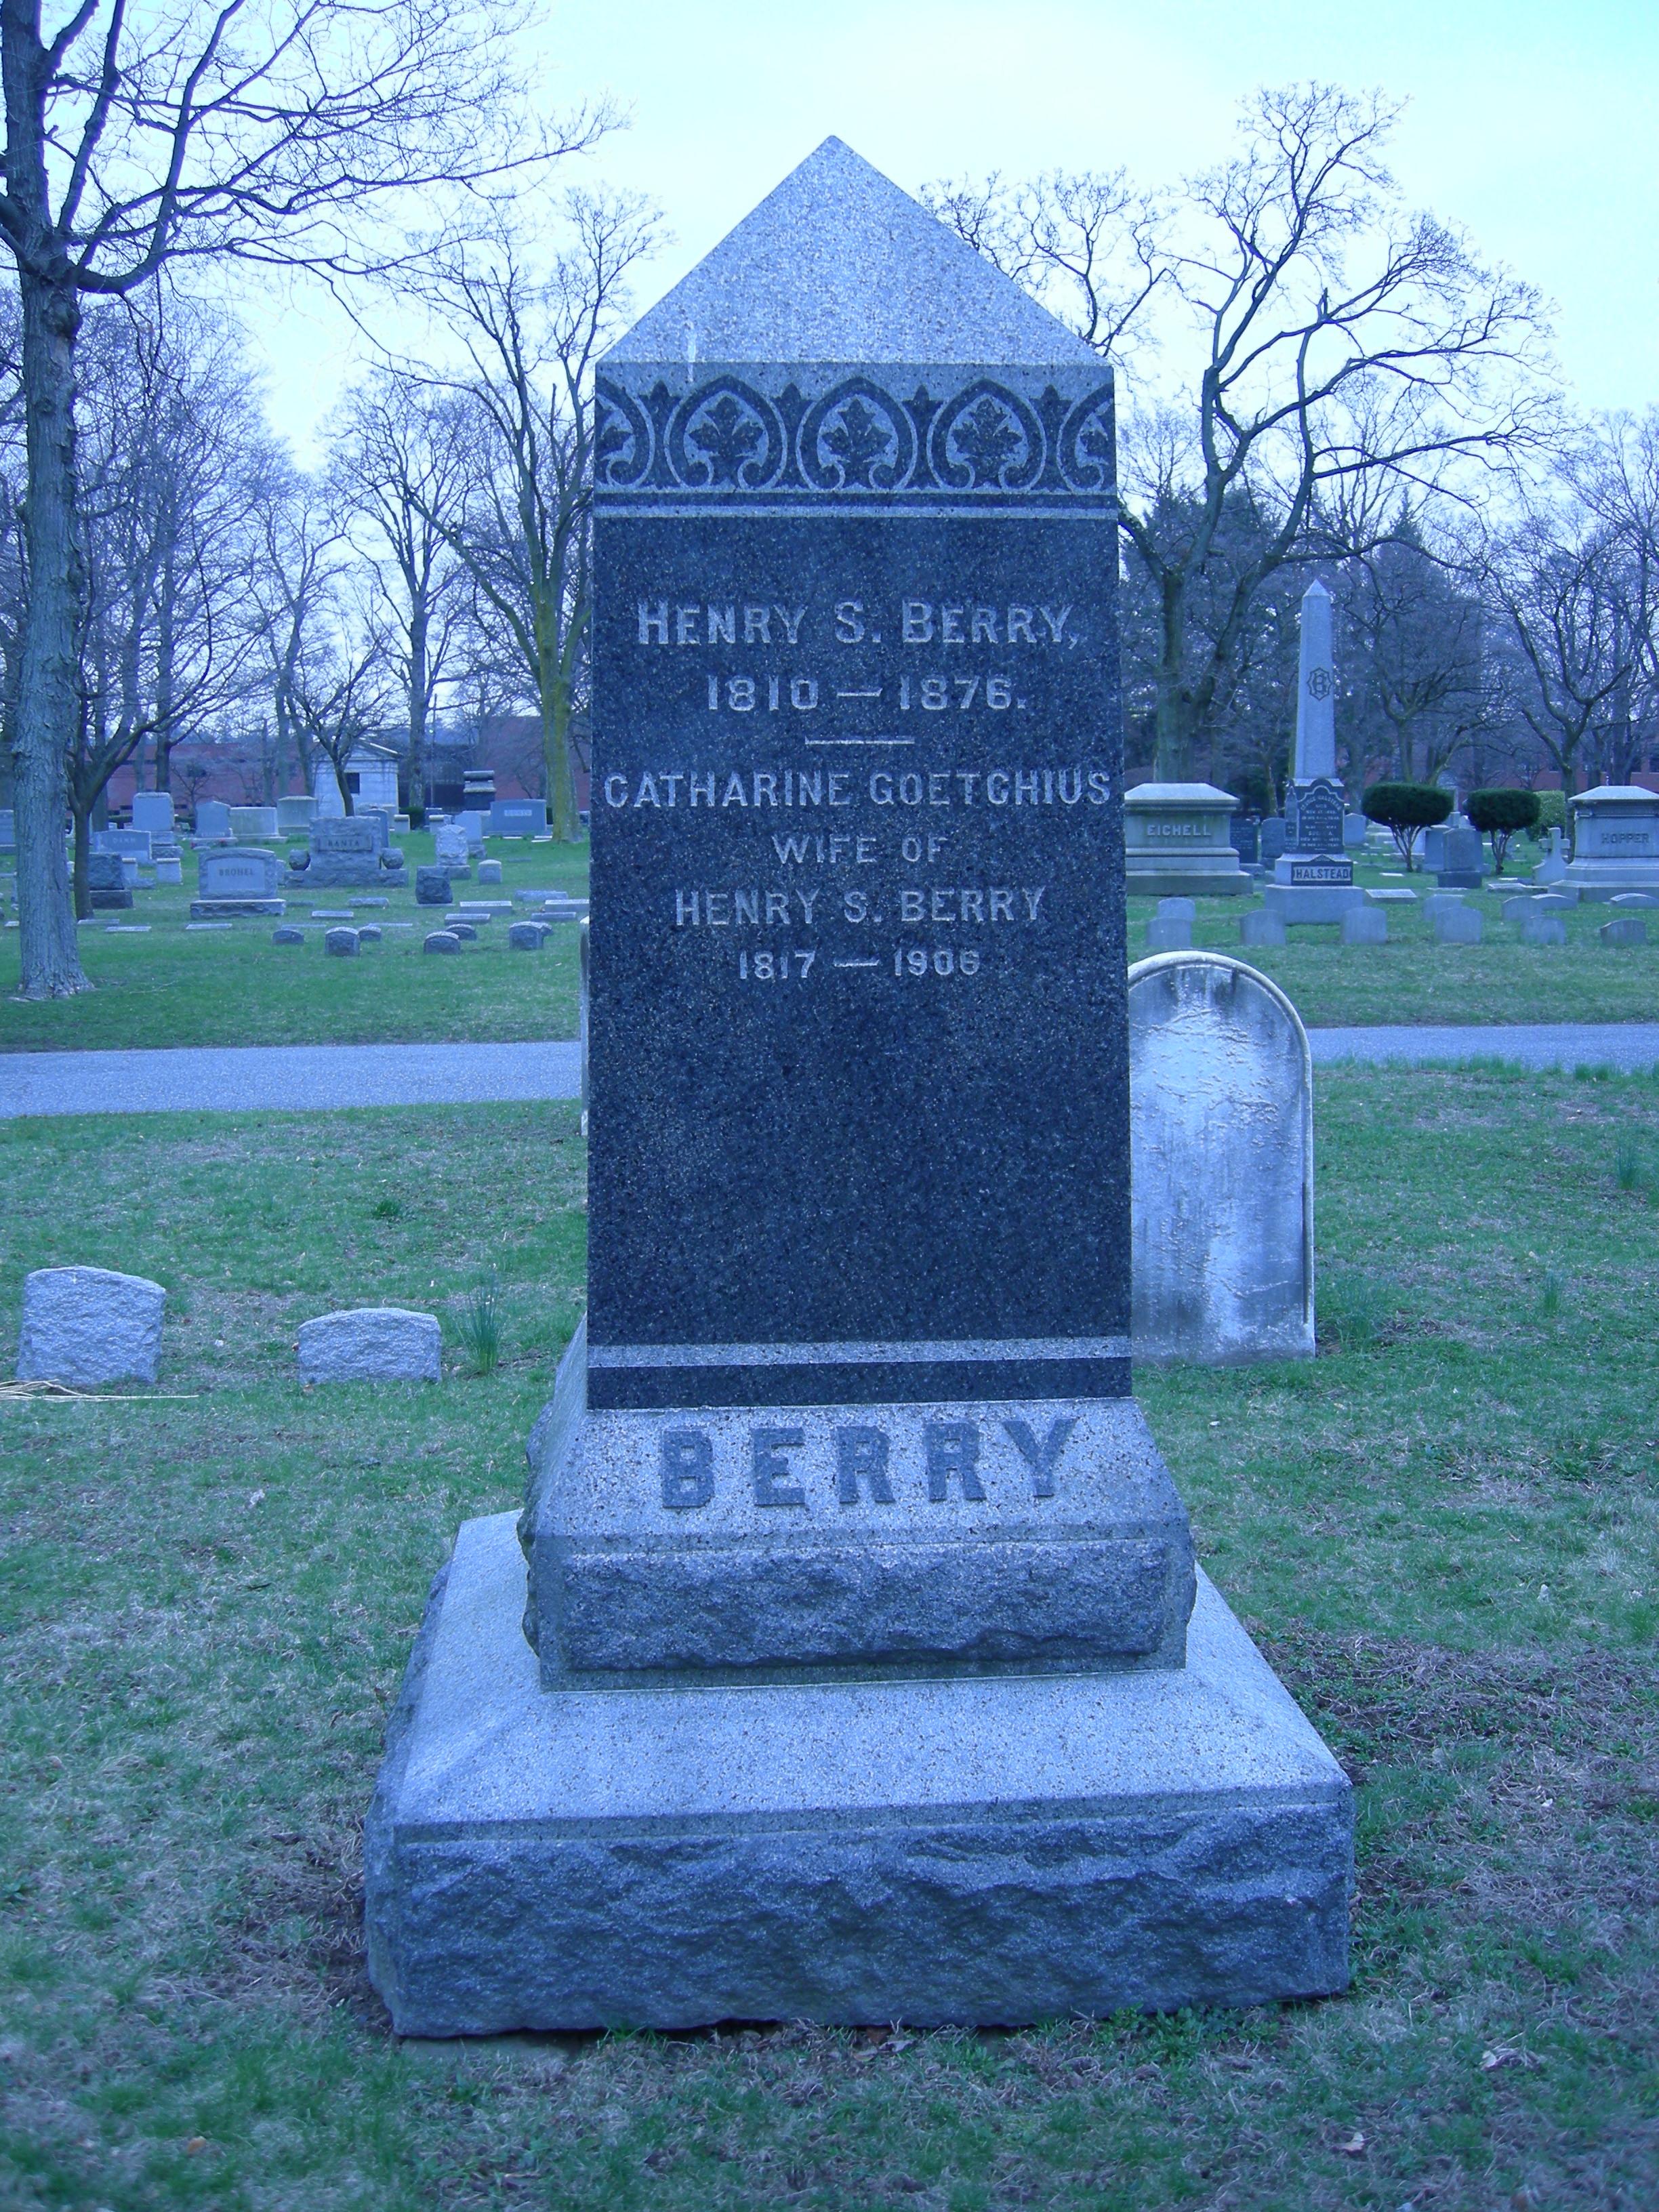 Henry S. Berry